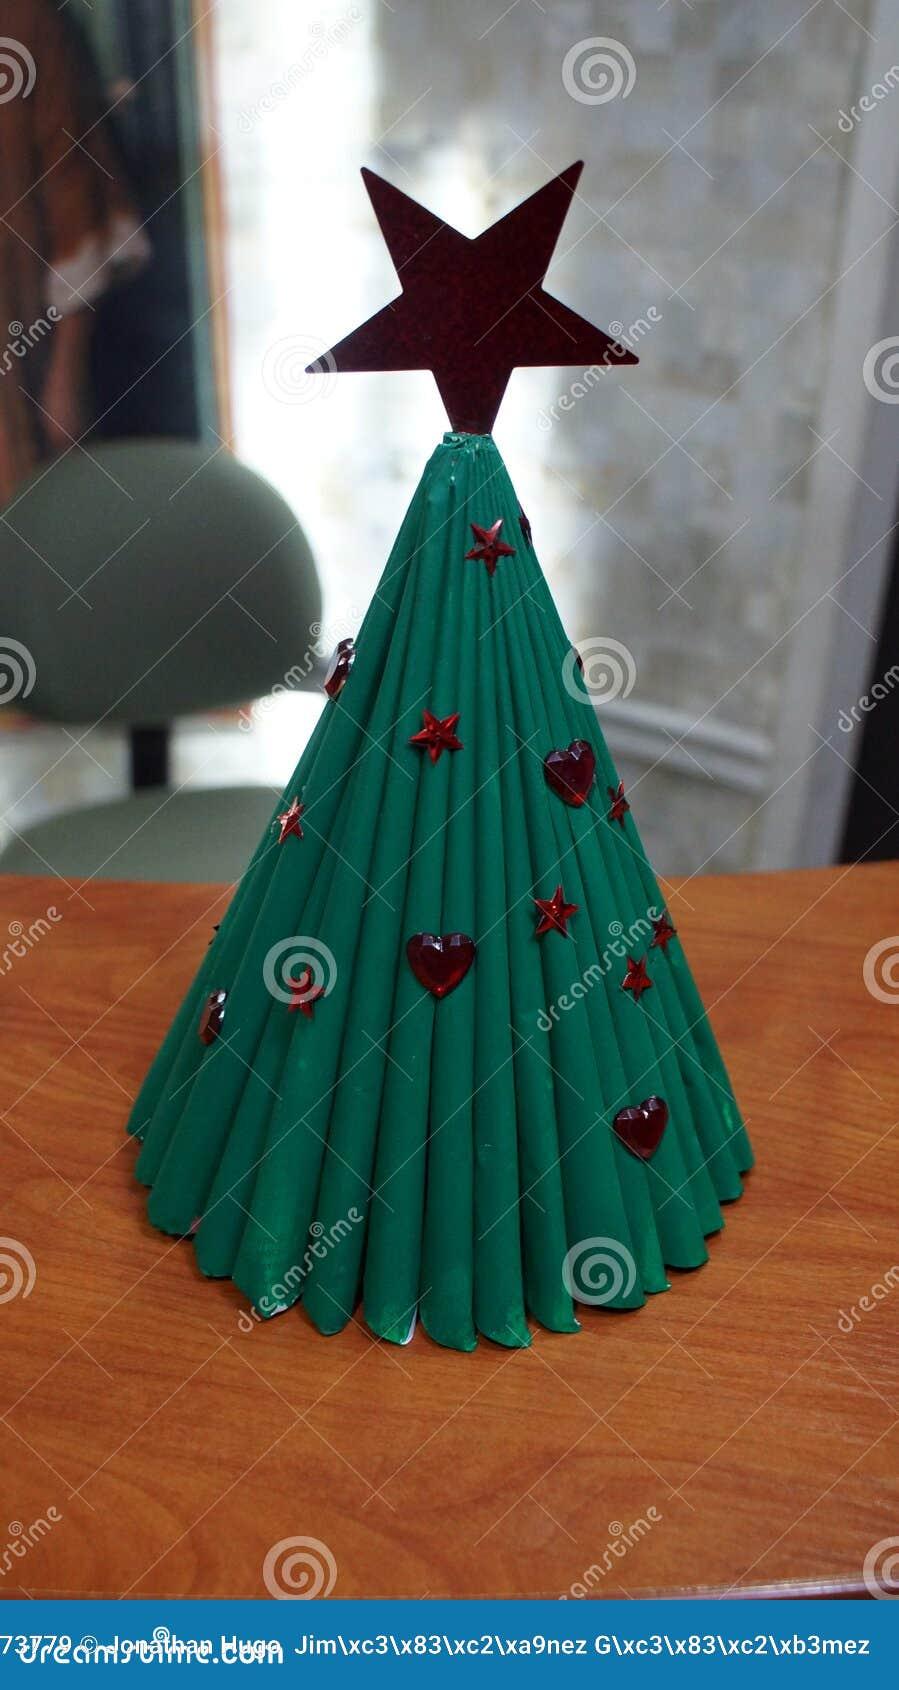 Hand Craft Christmas Tree Made Of Magazines Stock Image Image Of Representation Folded 165973779